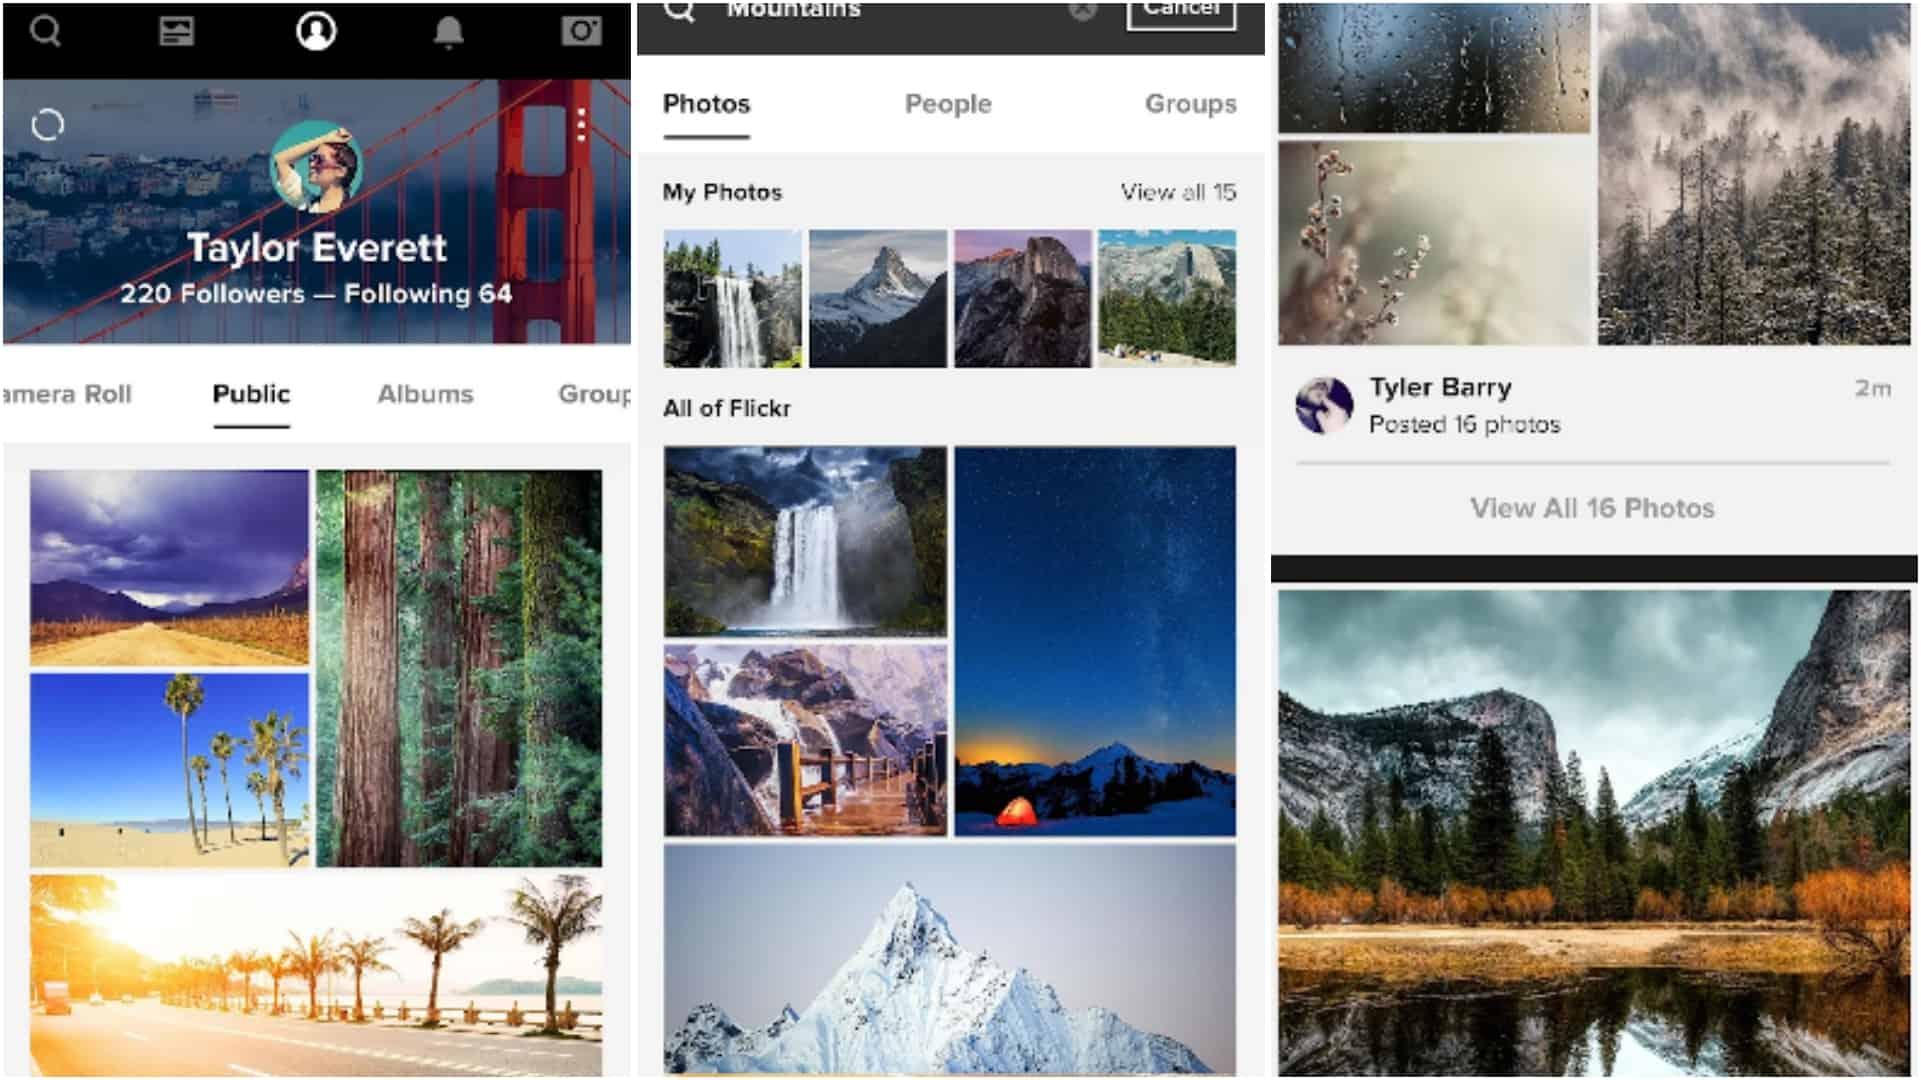 Flickr app grid image